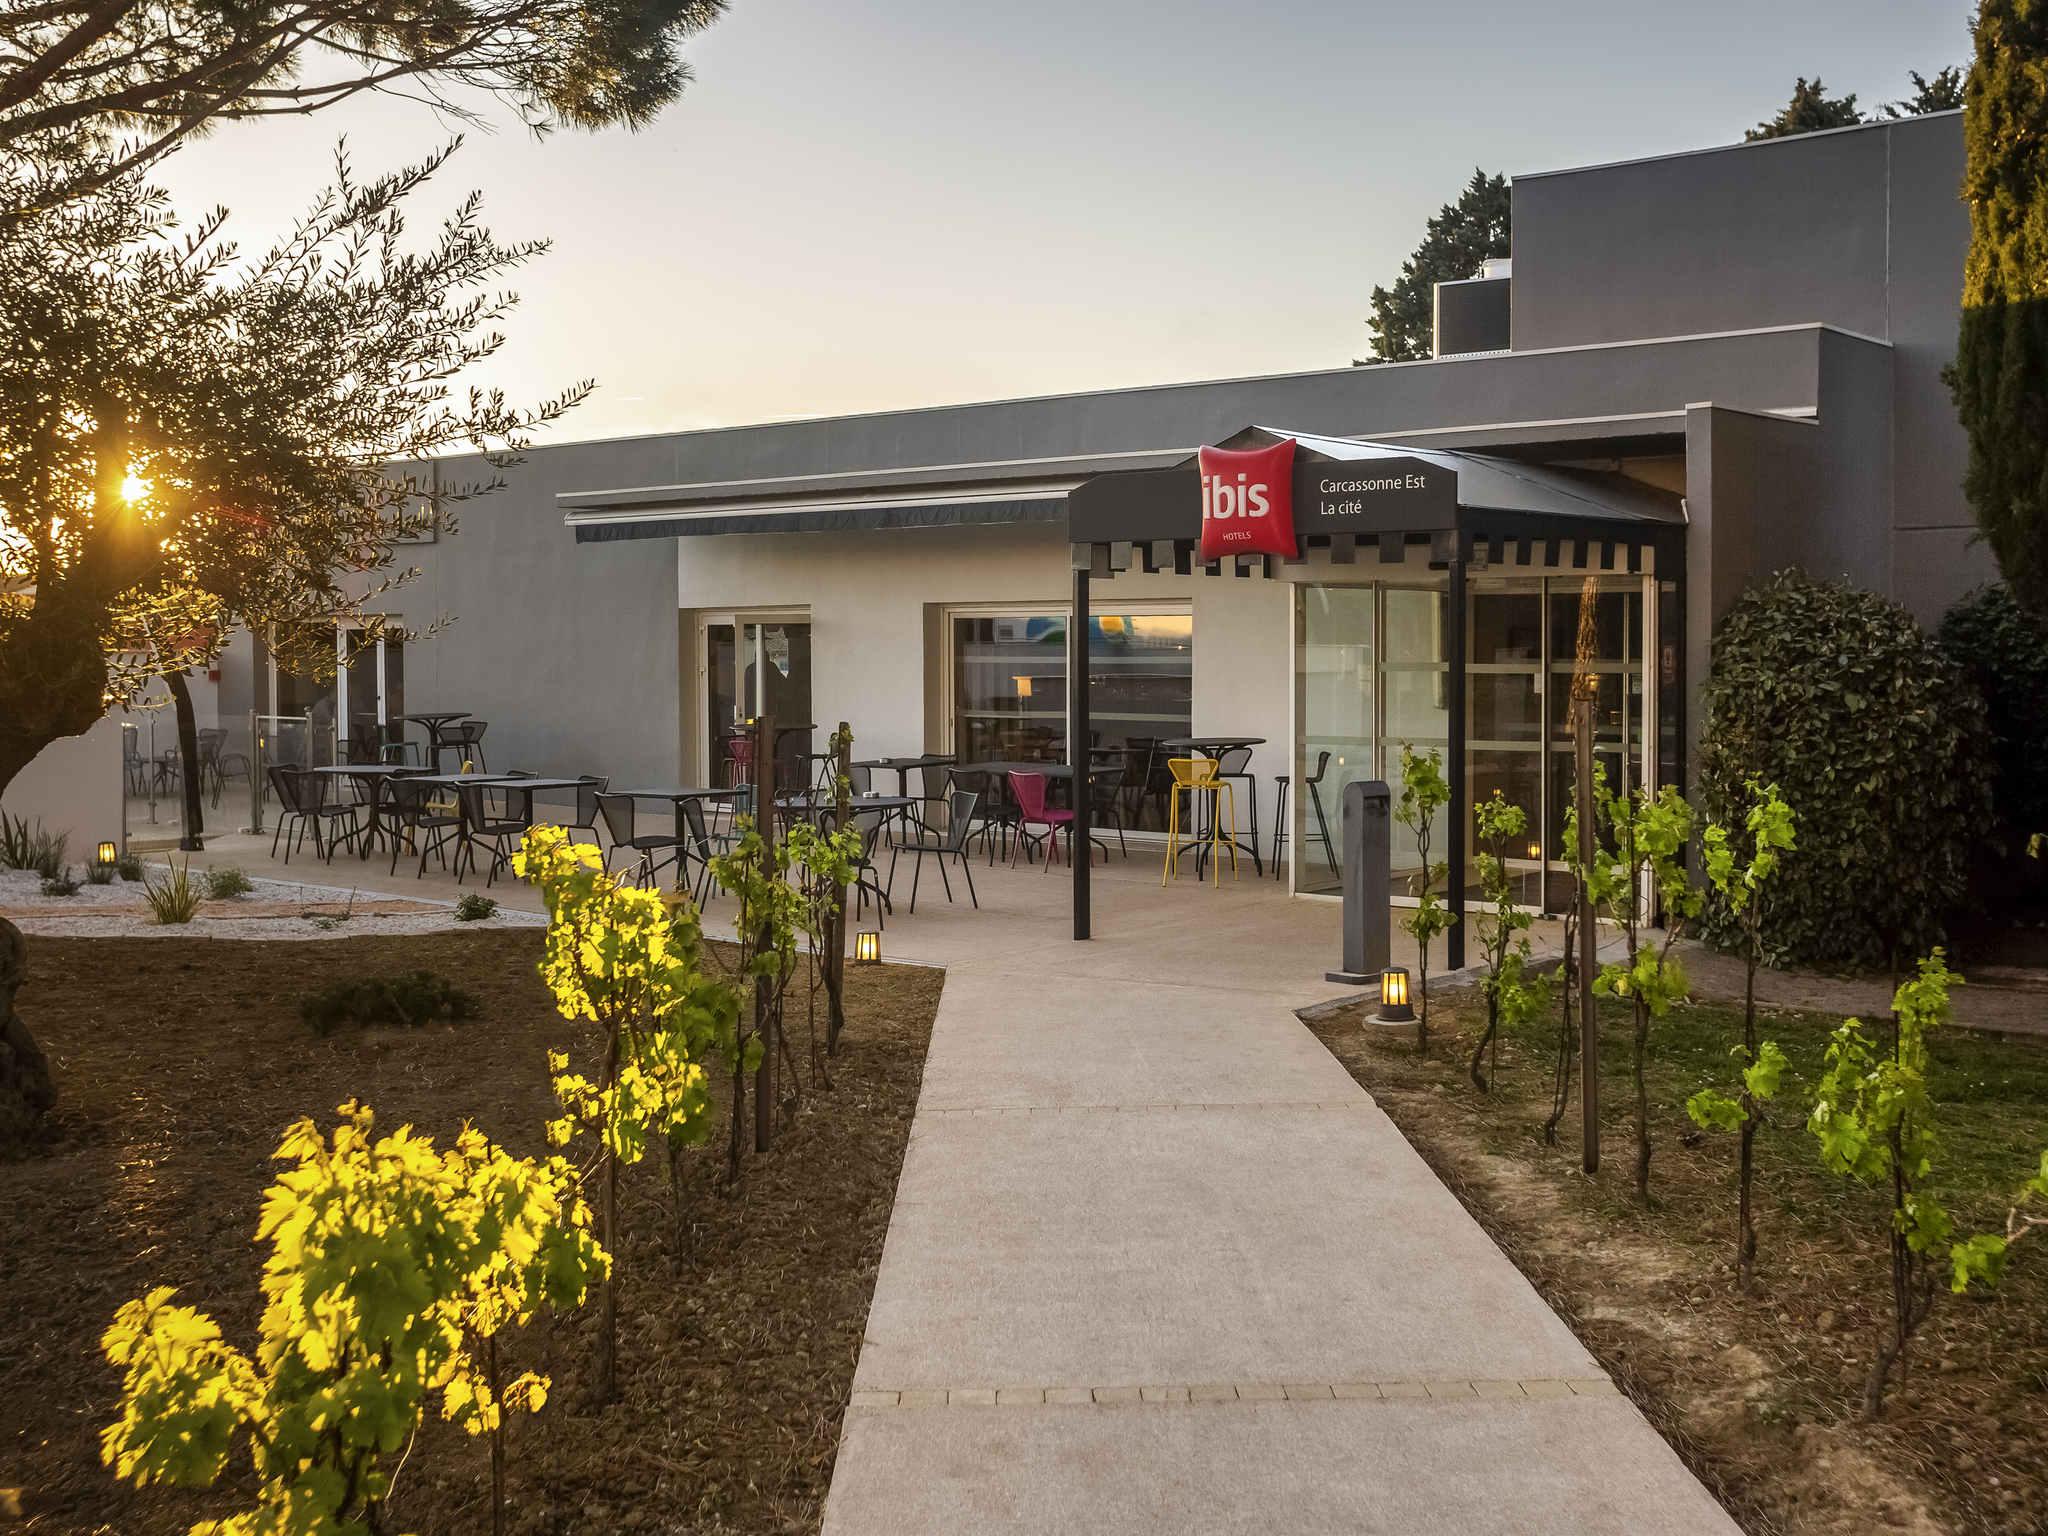 Hotel – ibis Carcassonne Est La Cite